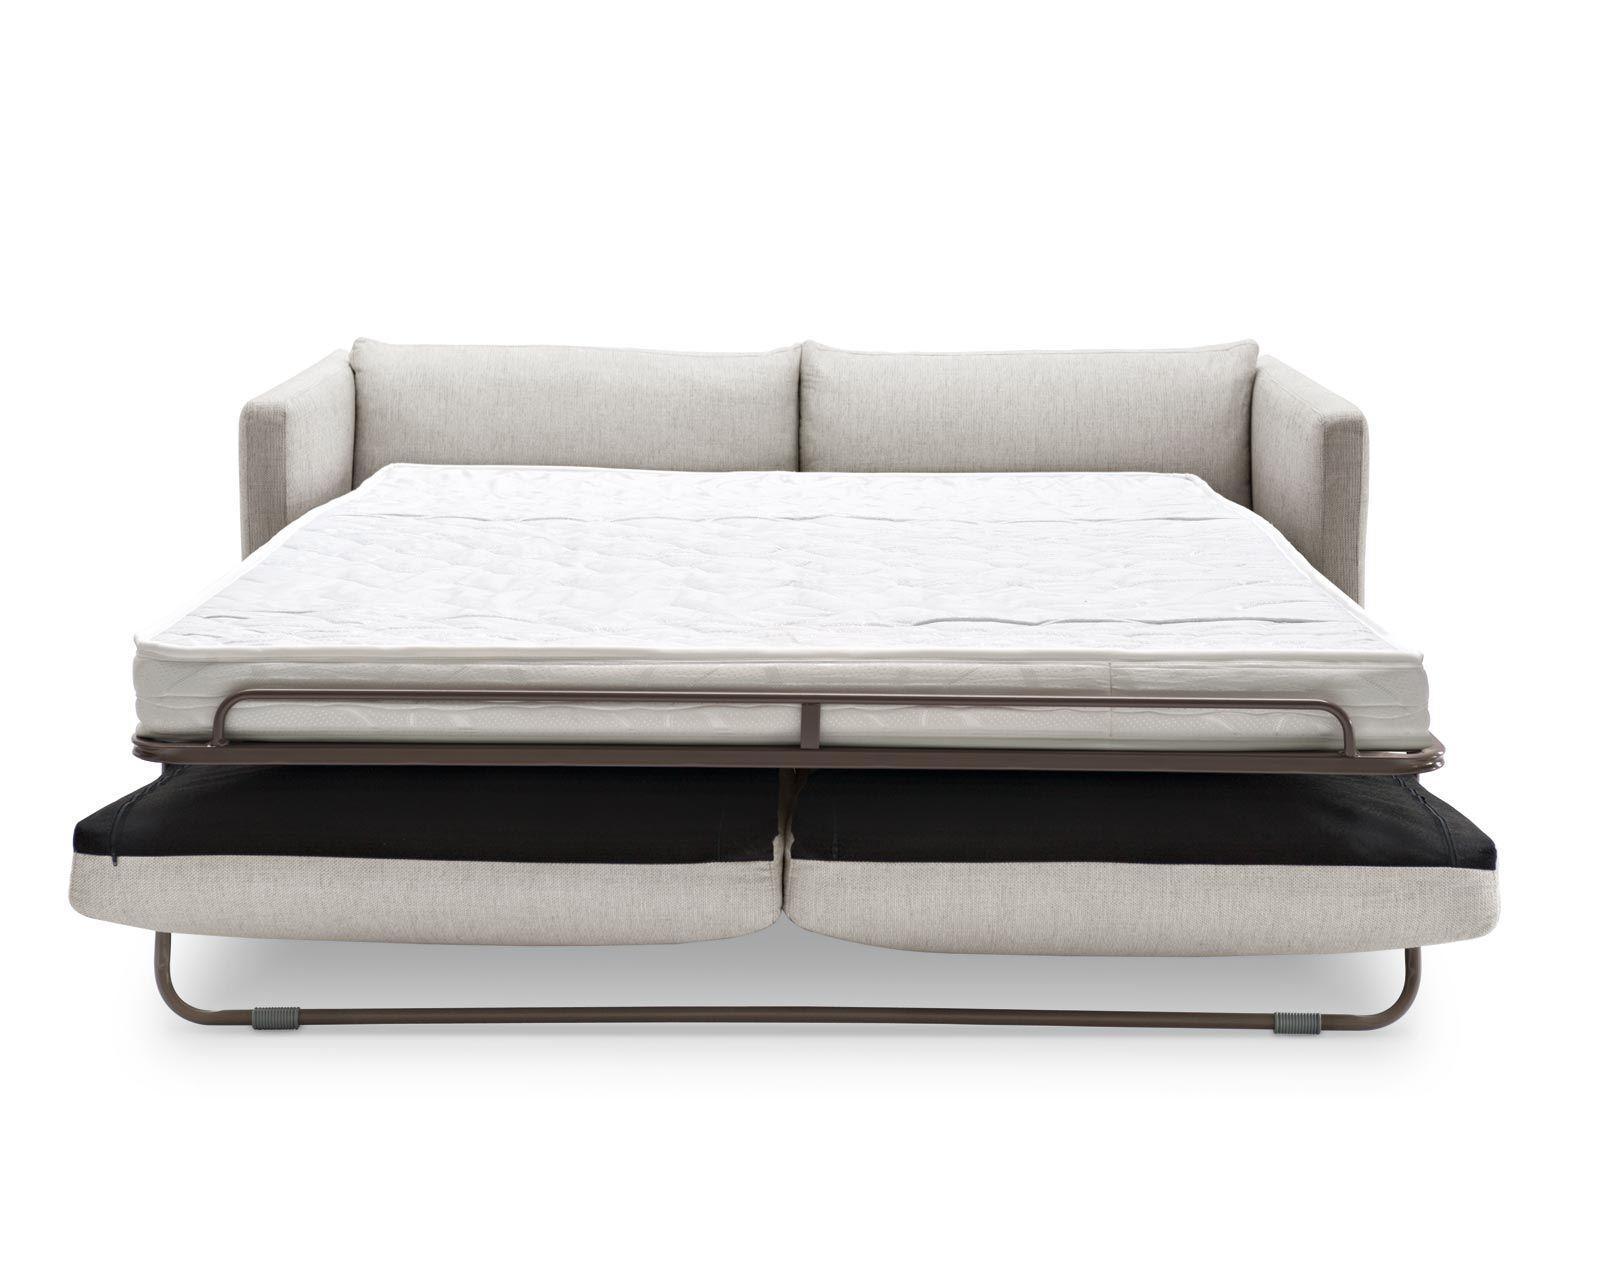 Sofa : Awesome Designer Sofa Beds Uk Beautiful Home Design For Awesome Sofa (View 20 of 20)